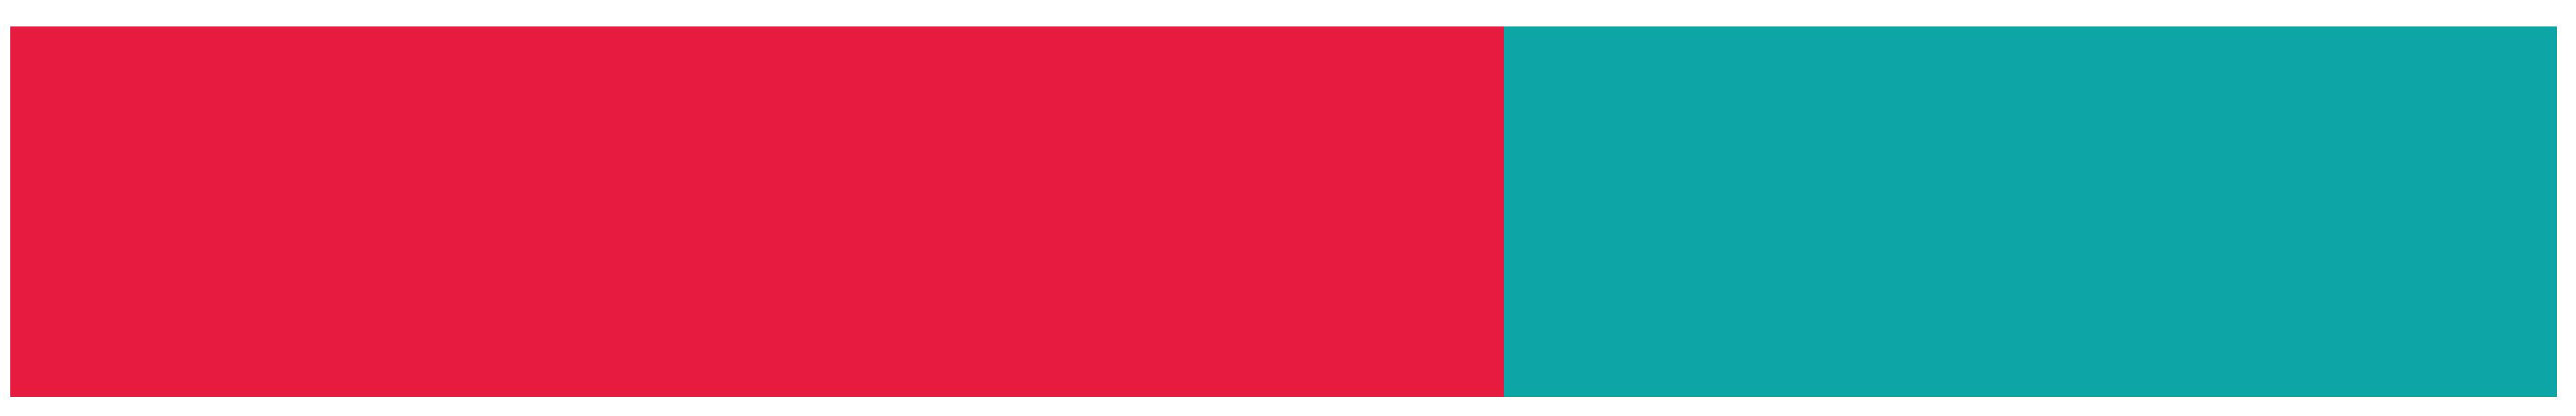 humancraft logo